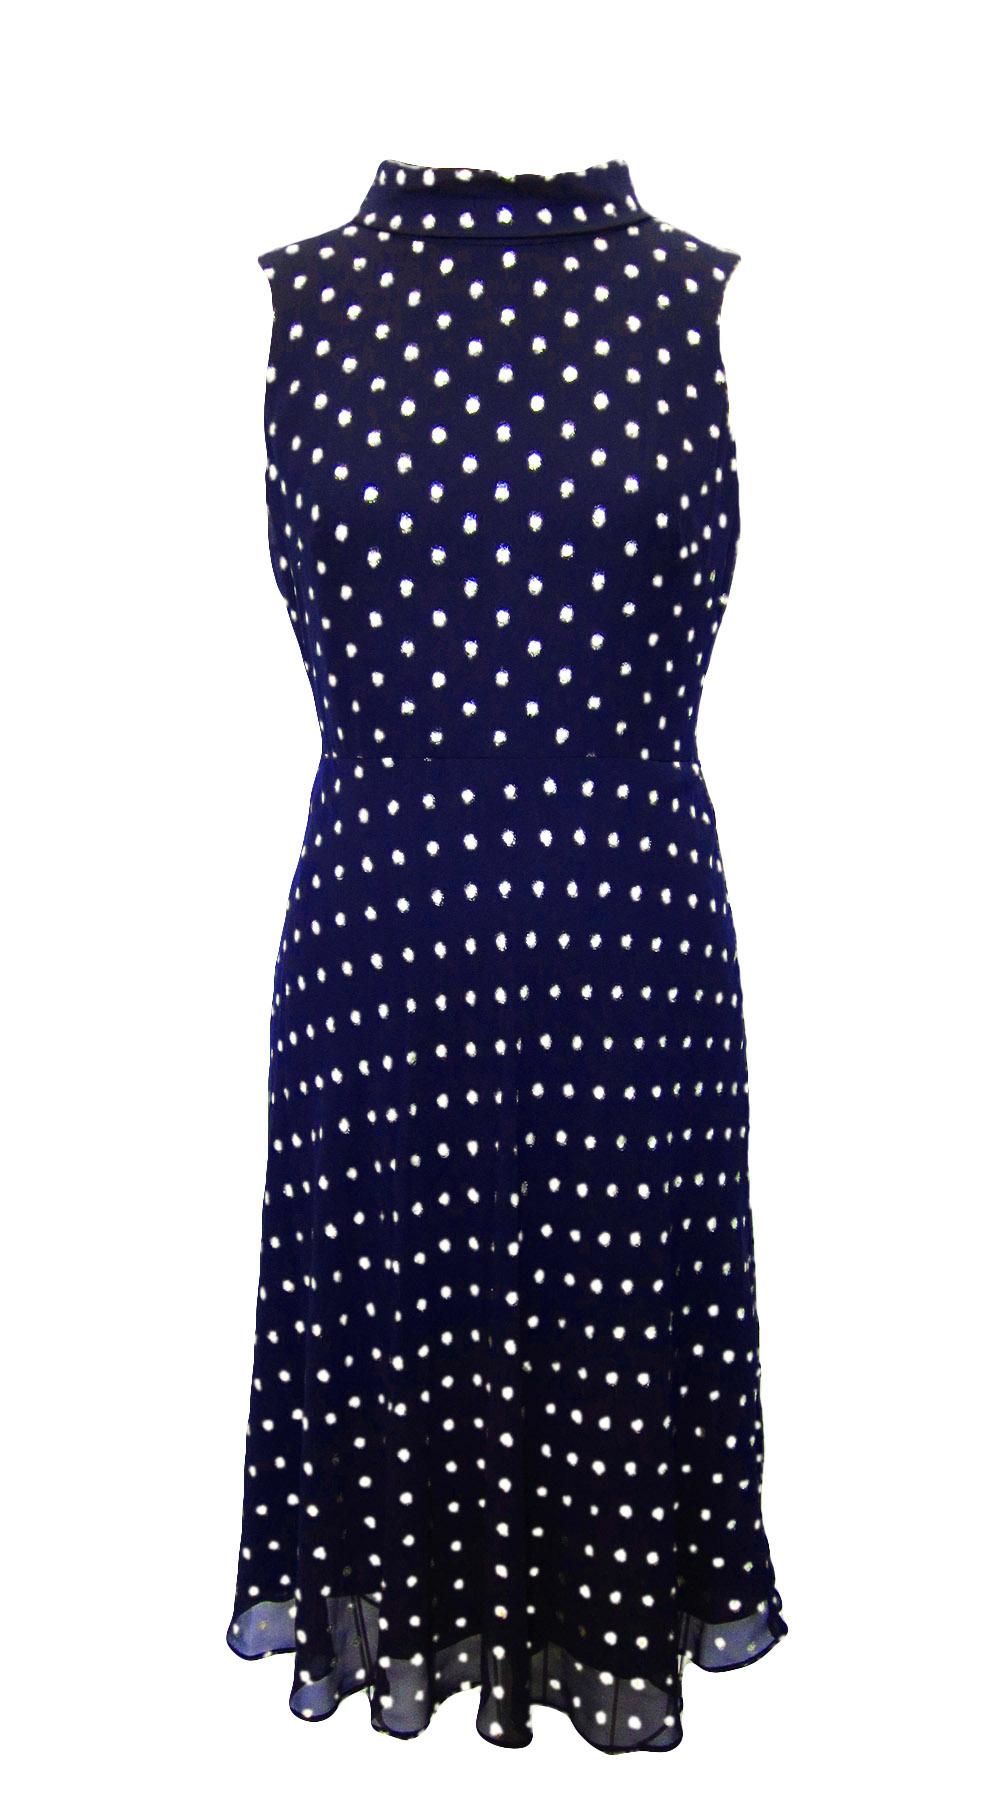 dress navy white dots 2.jpg